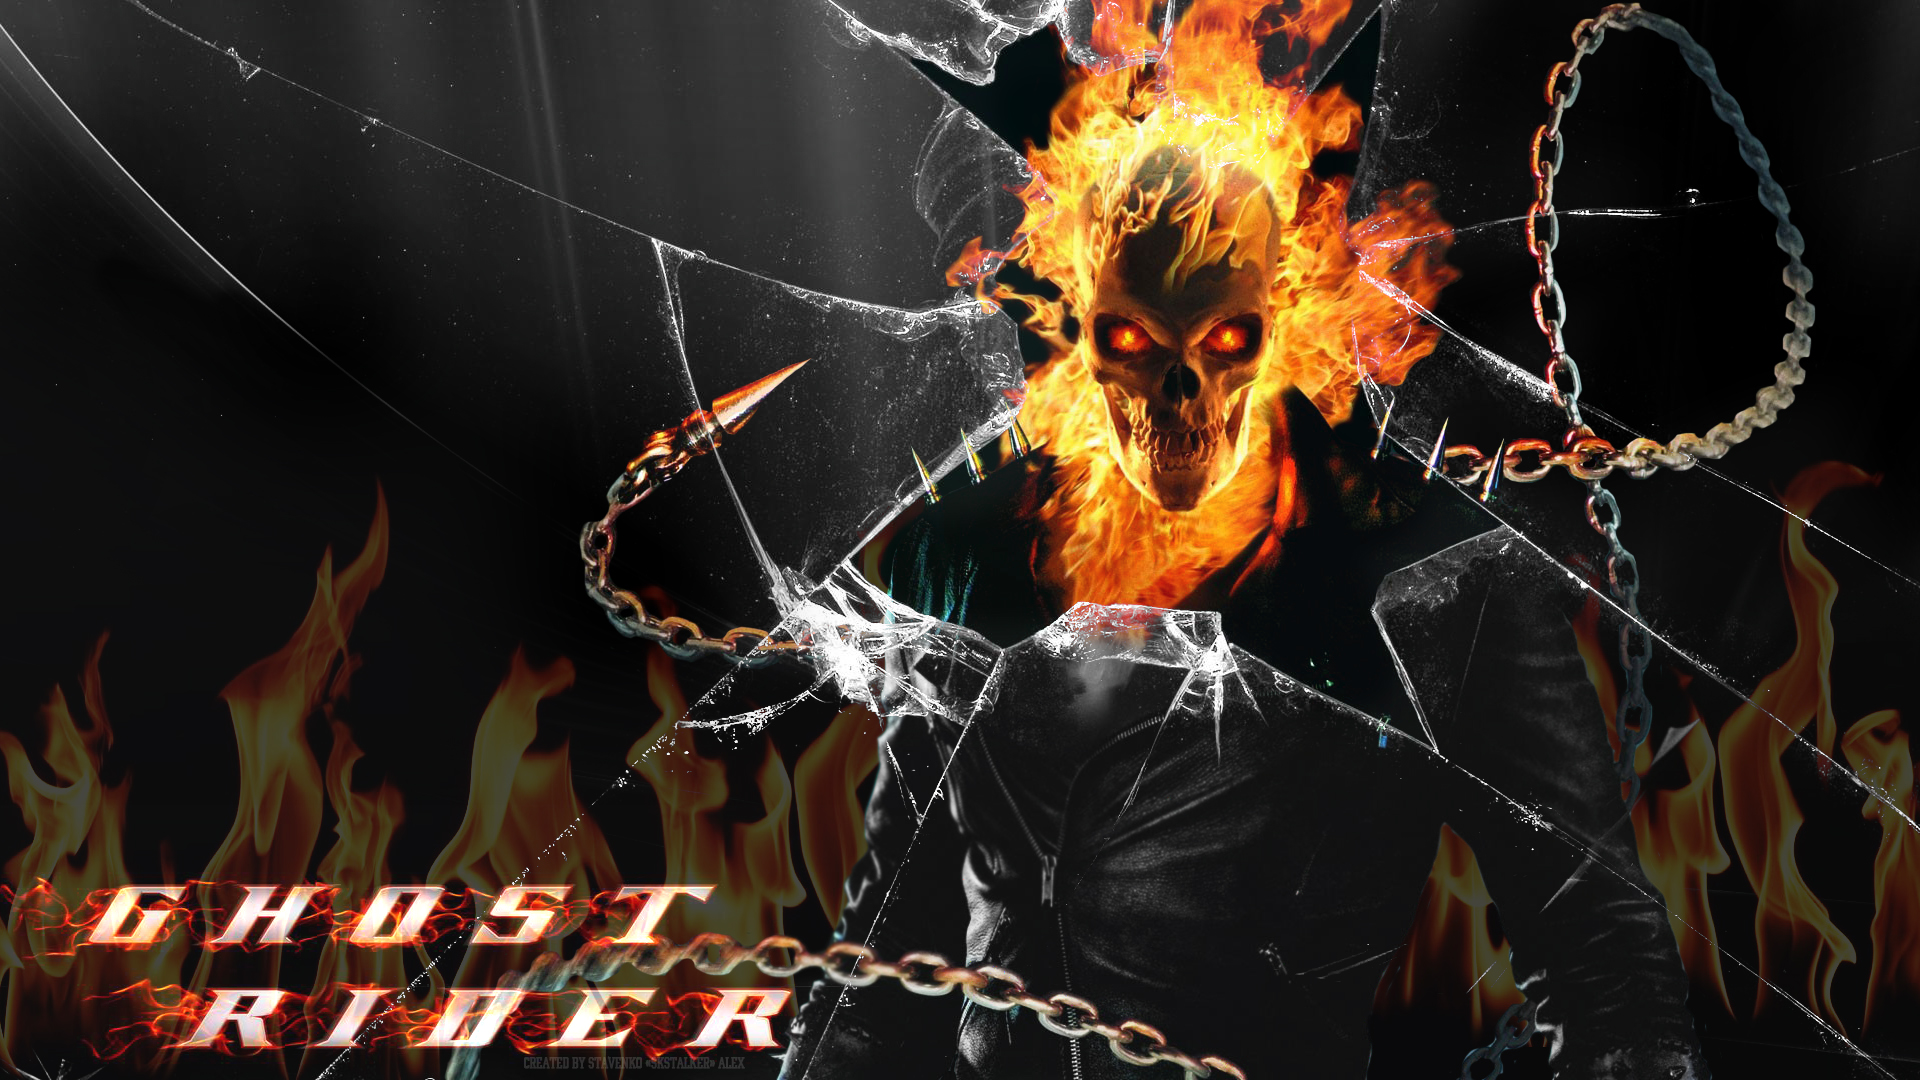 Ghost Rider Wallpaper 1080 by SKstalker 1920x1080